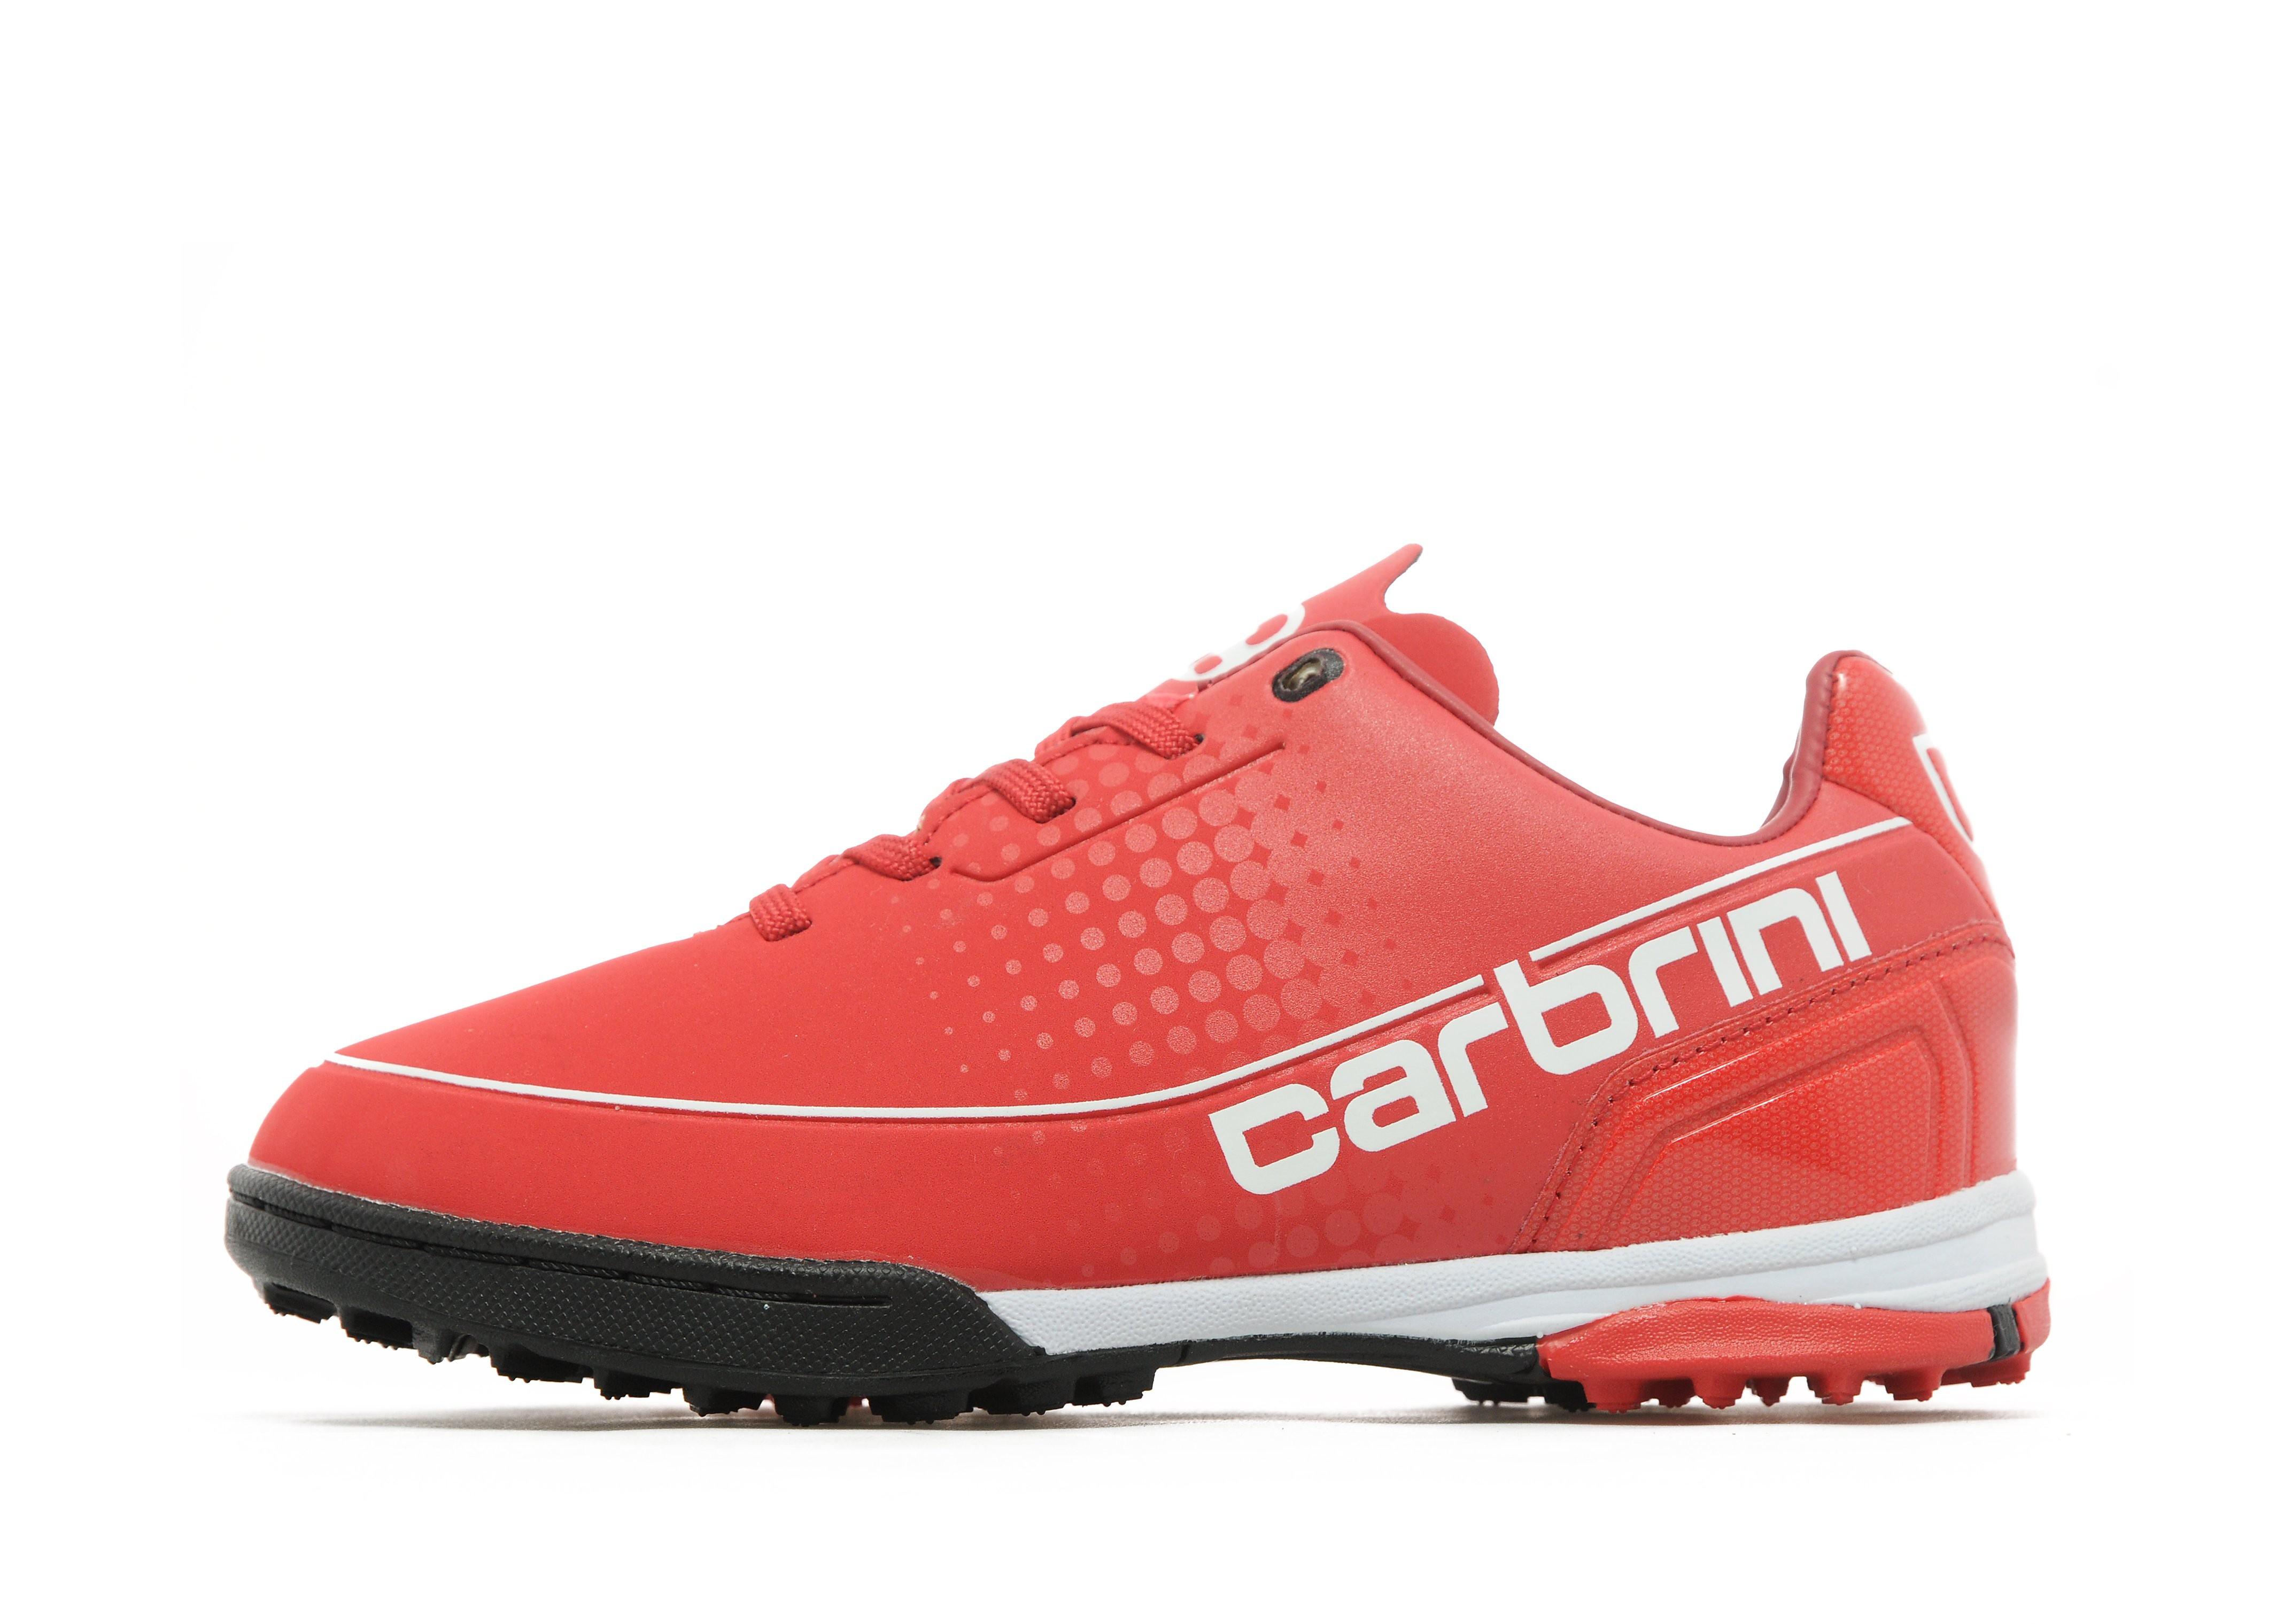 Carbrini Velocity Turf Children